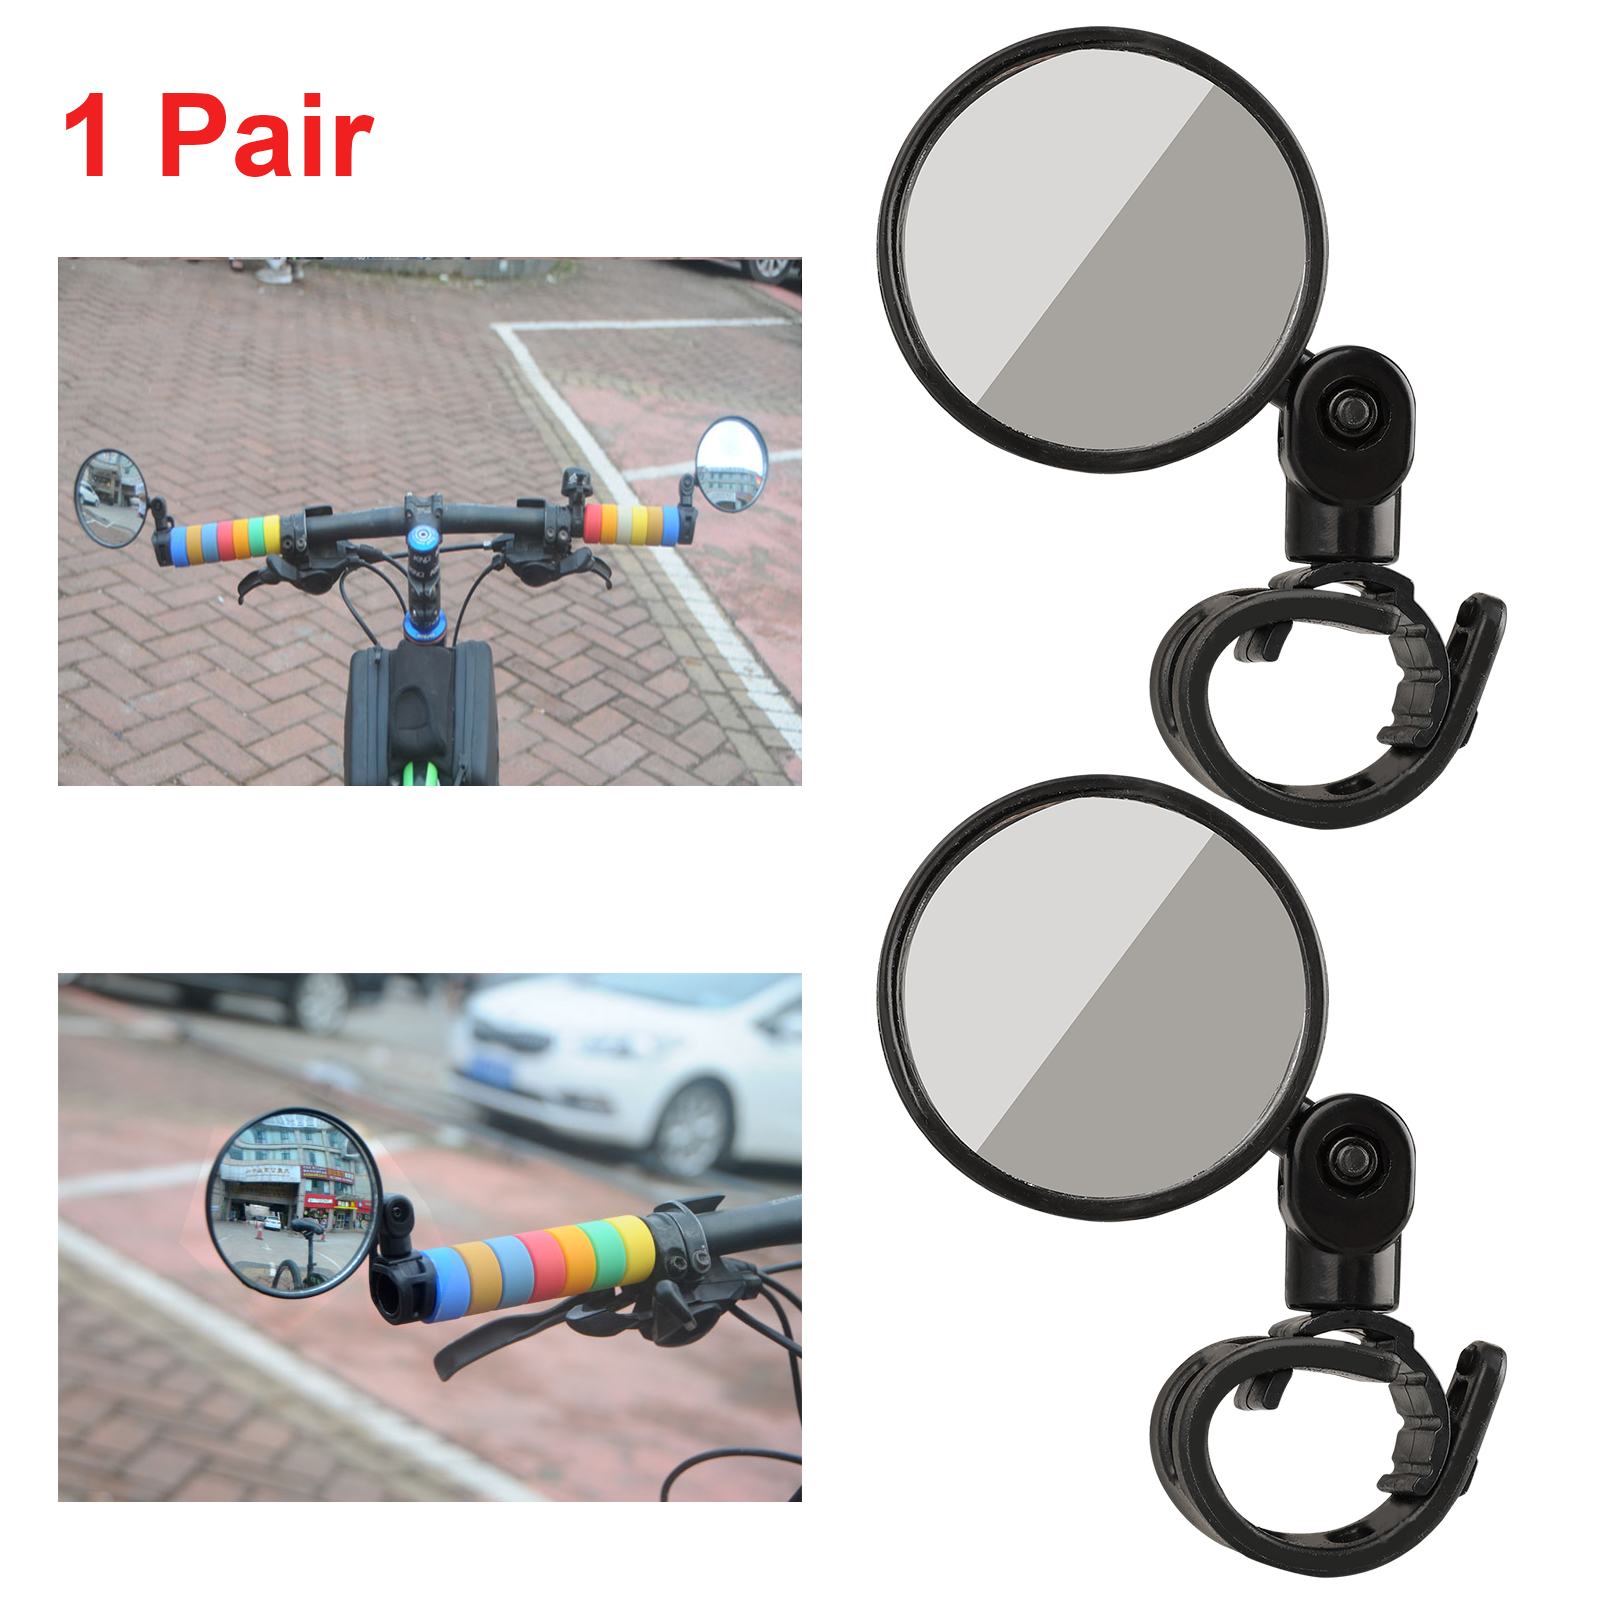 Adjustable Mountain Bike Bicycle Handlebar Side Rearview Mirrors Glasses Heal